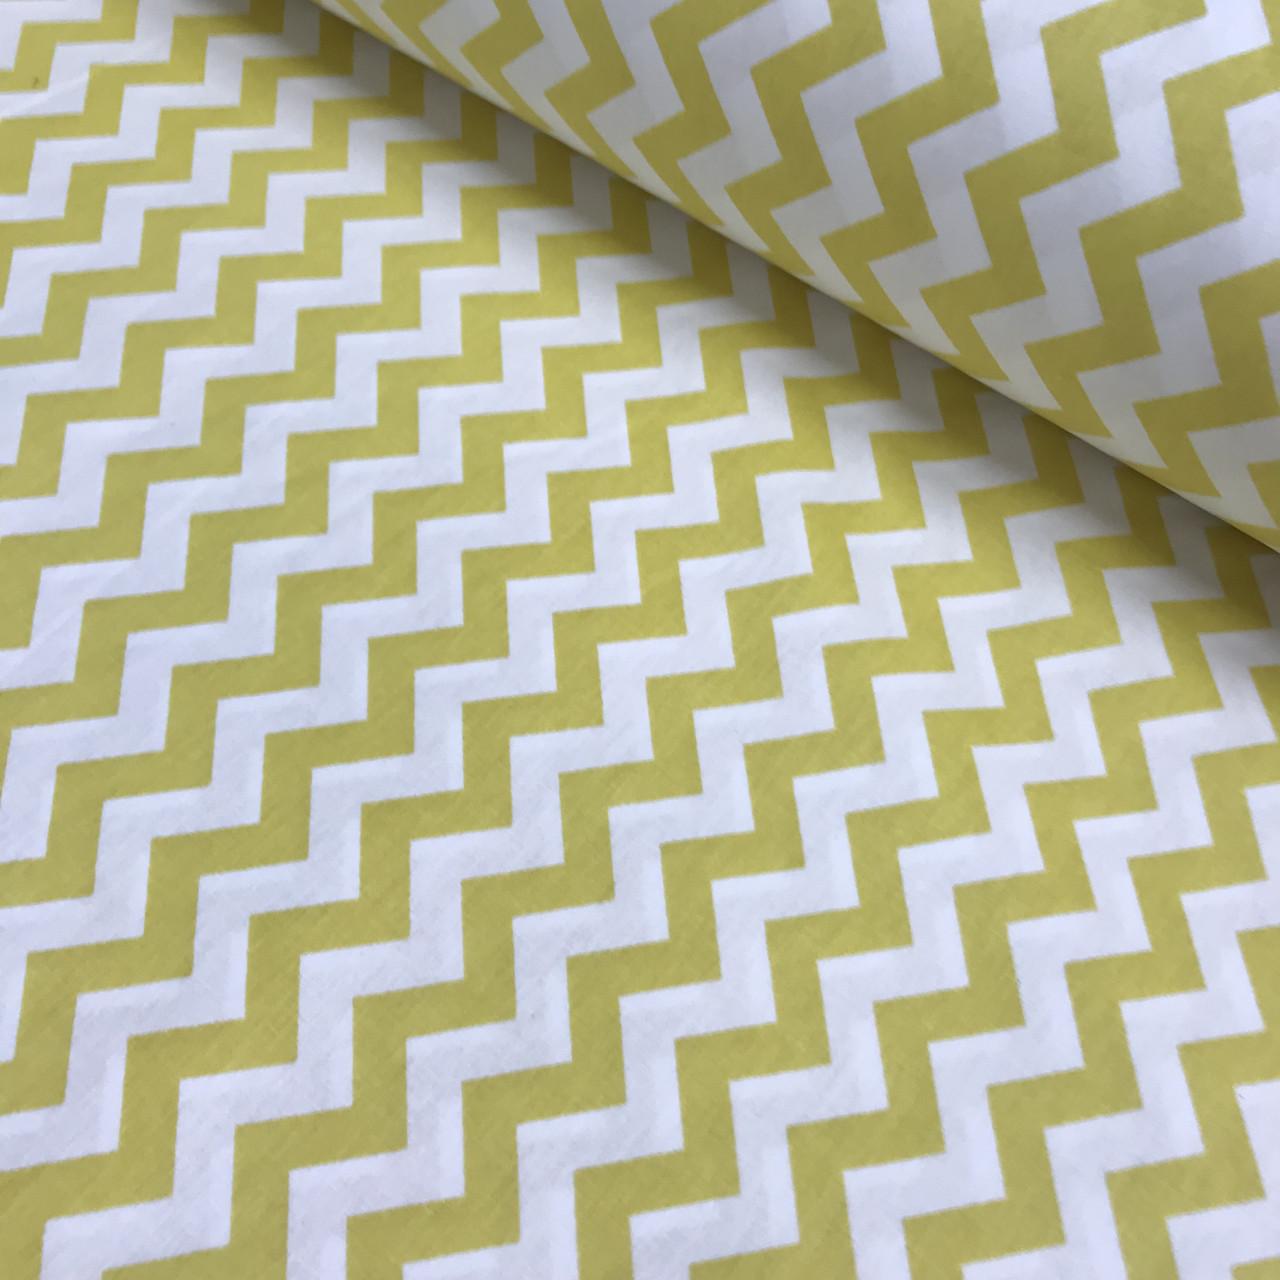 Ткань поплин зигзаг желтый на белом (ТУРЦИЯ шир. 2,4 м) №33-10